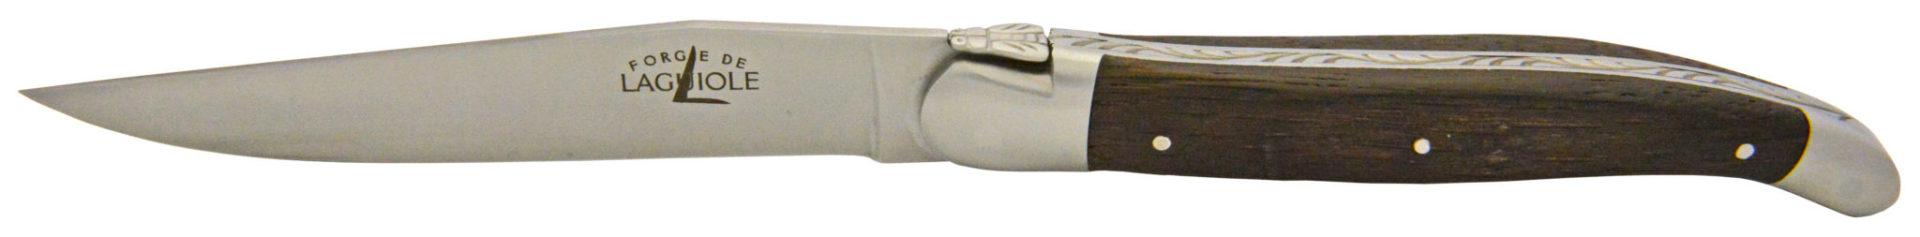 subfossil Forge de Laguiole pocket knife